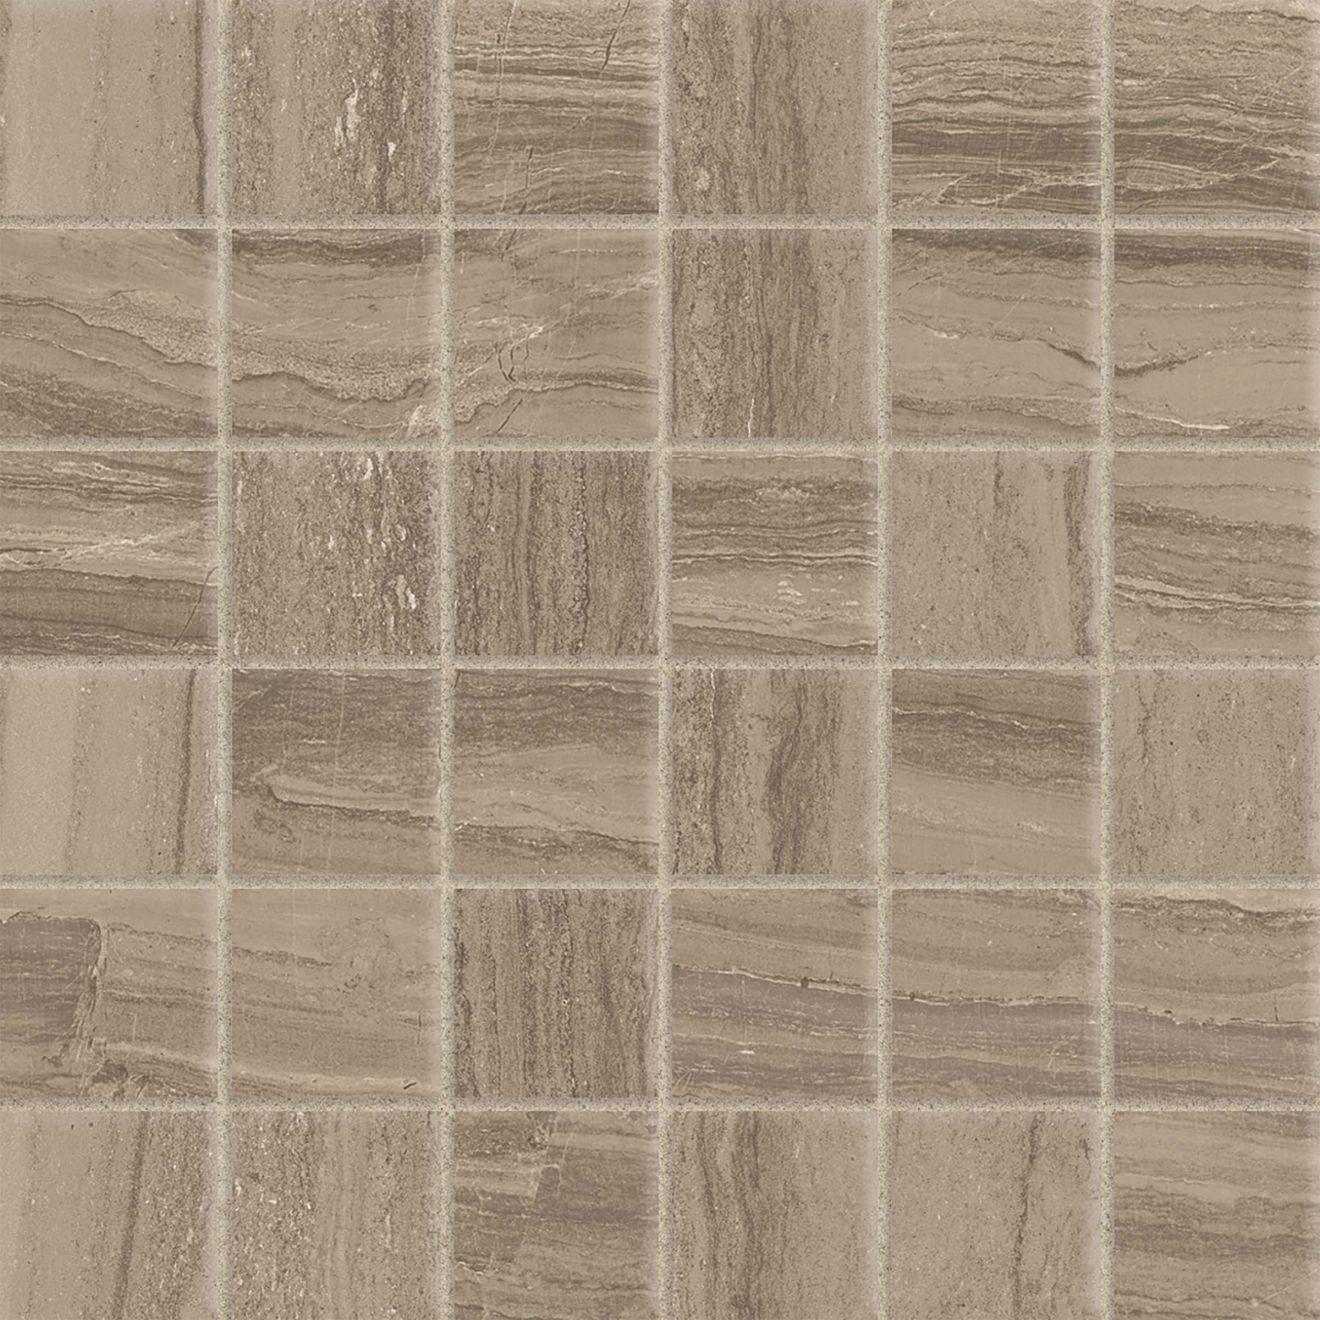 "Highland 2"" x 2"" Floor & Wall Mosaic in Beige"